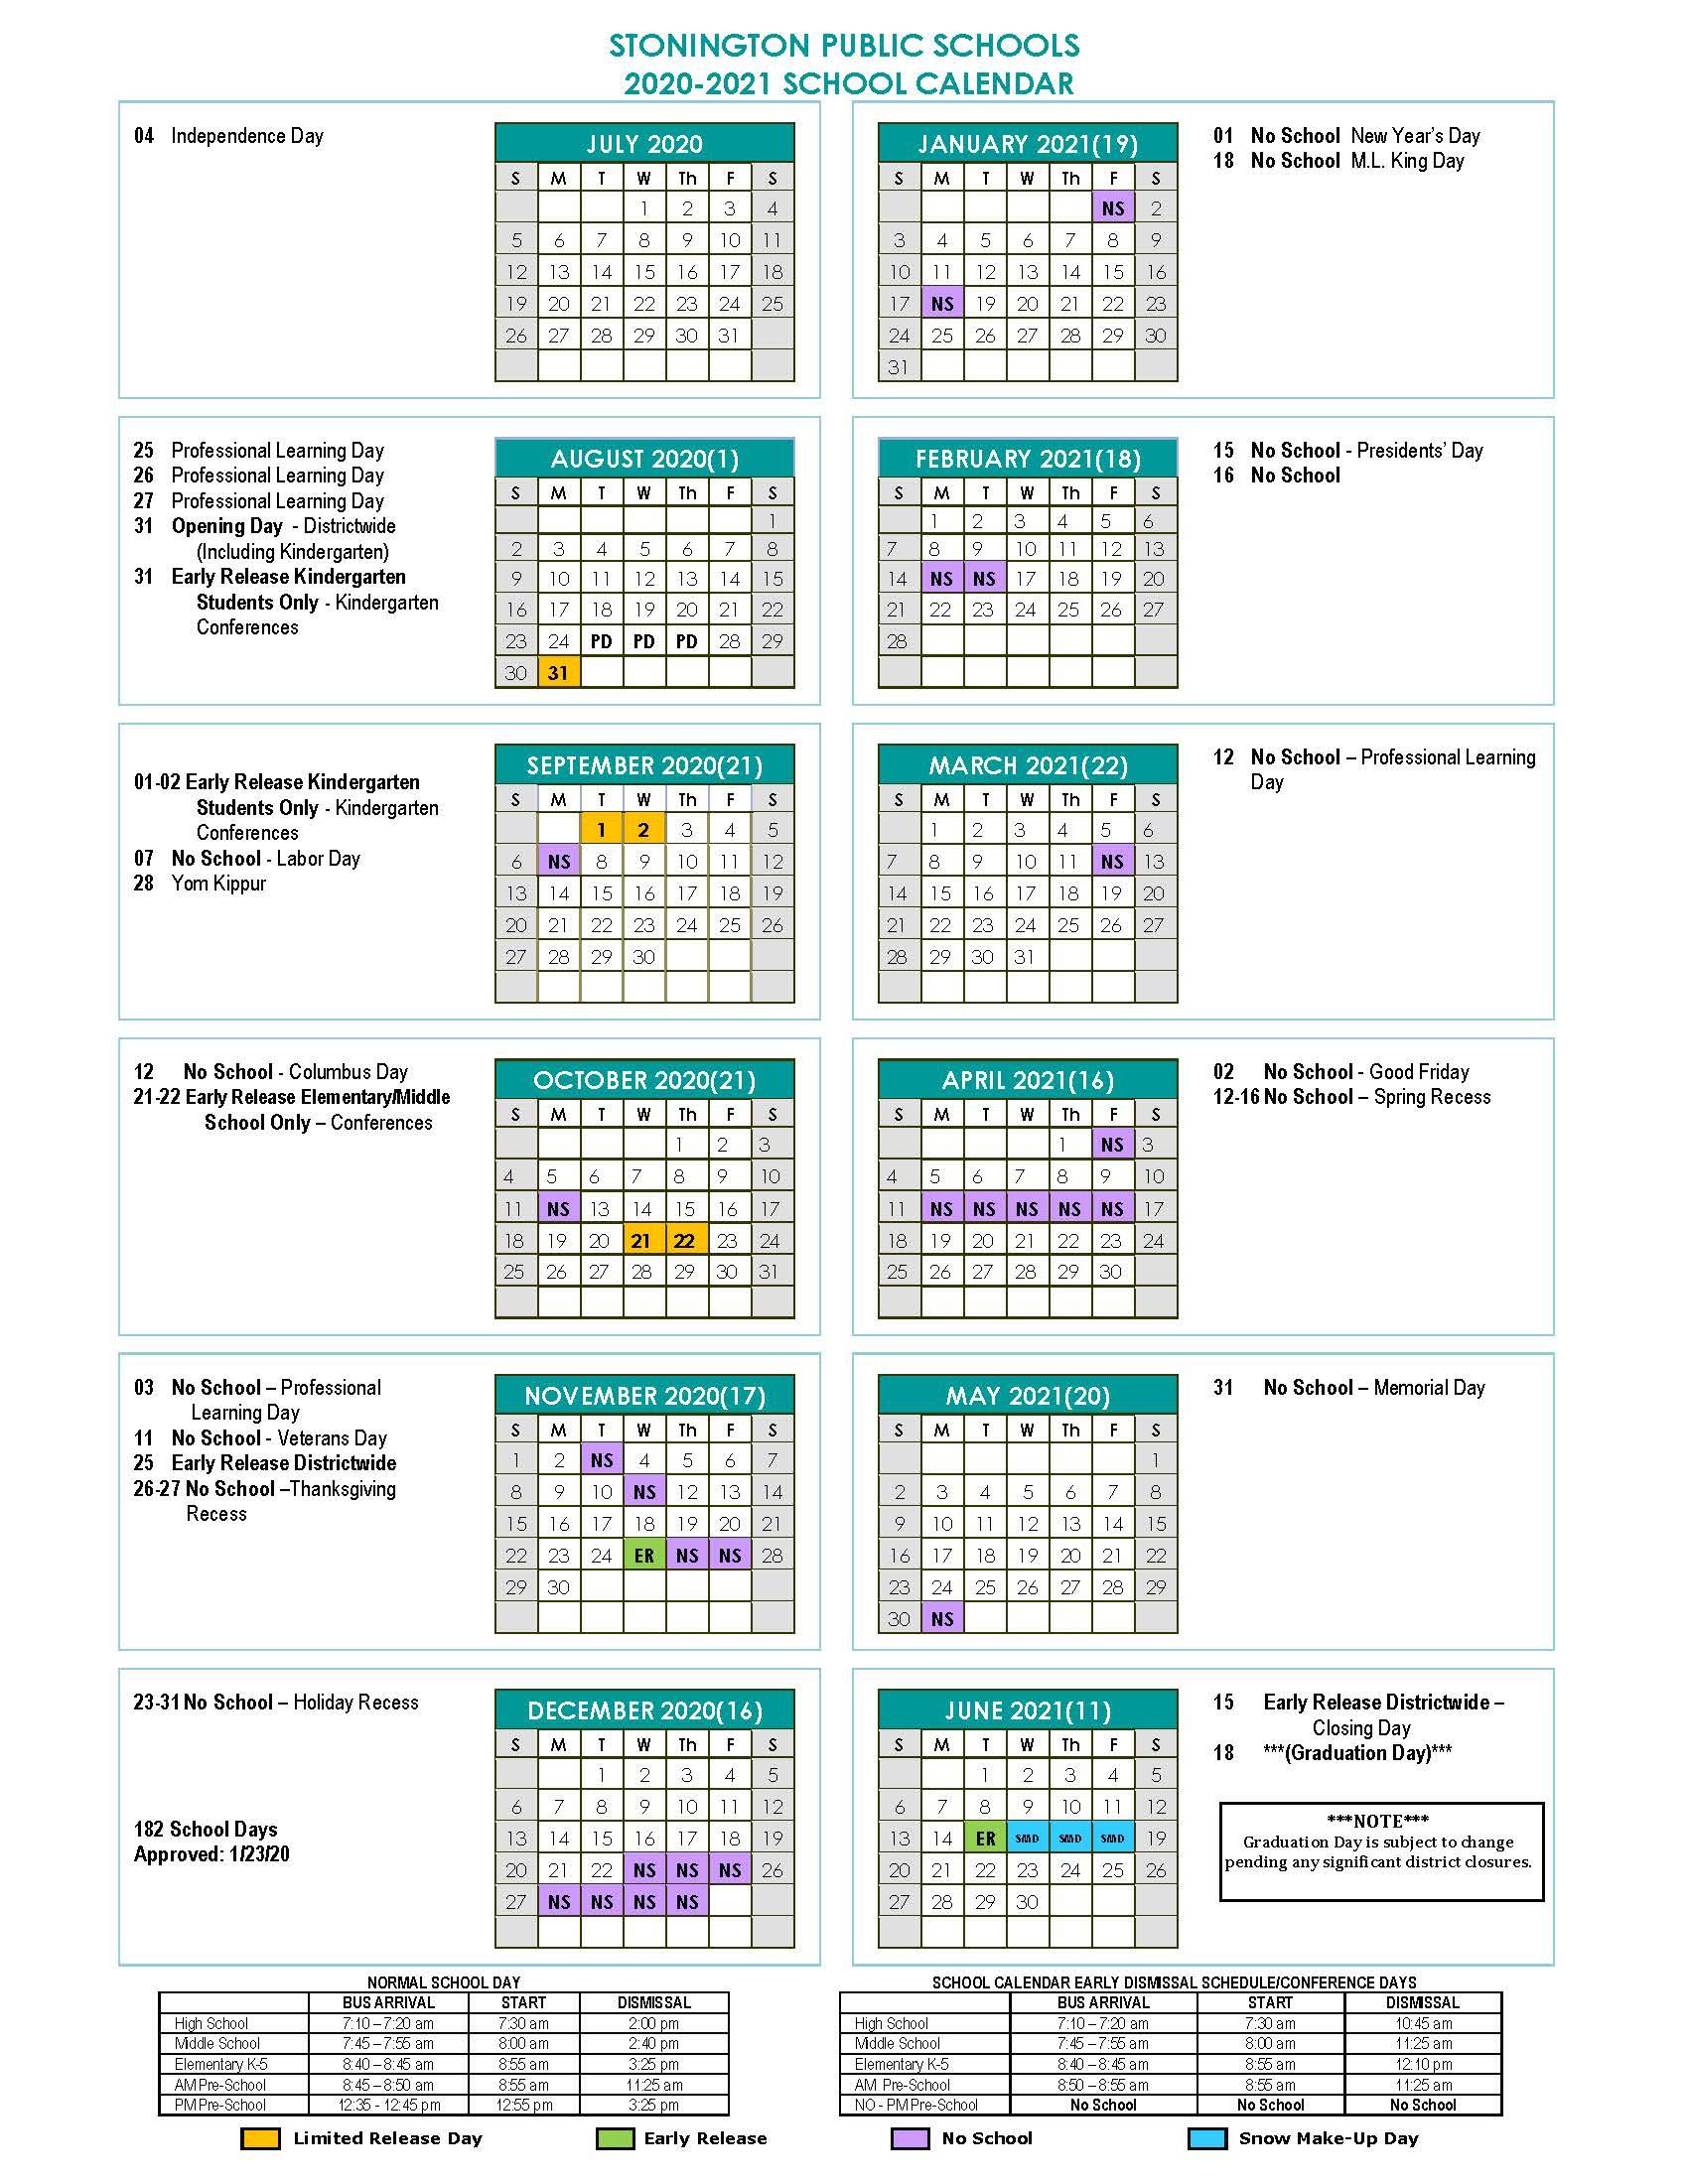 Stonington Public Schools Calendar 2020 And 2021 With Regard To Smithtown School Calendar 2021 20